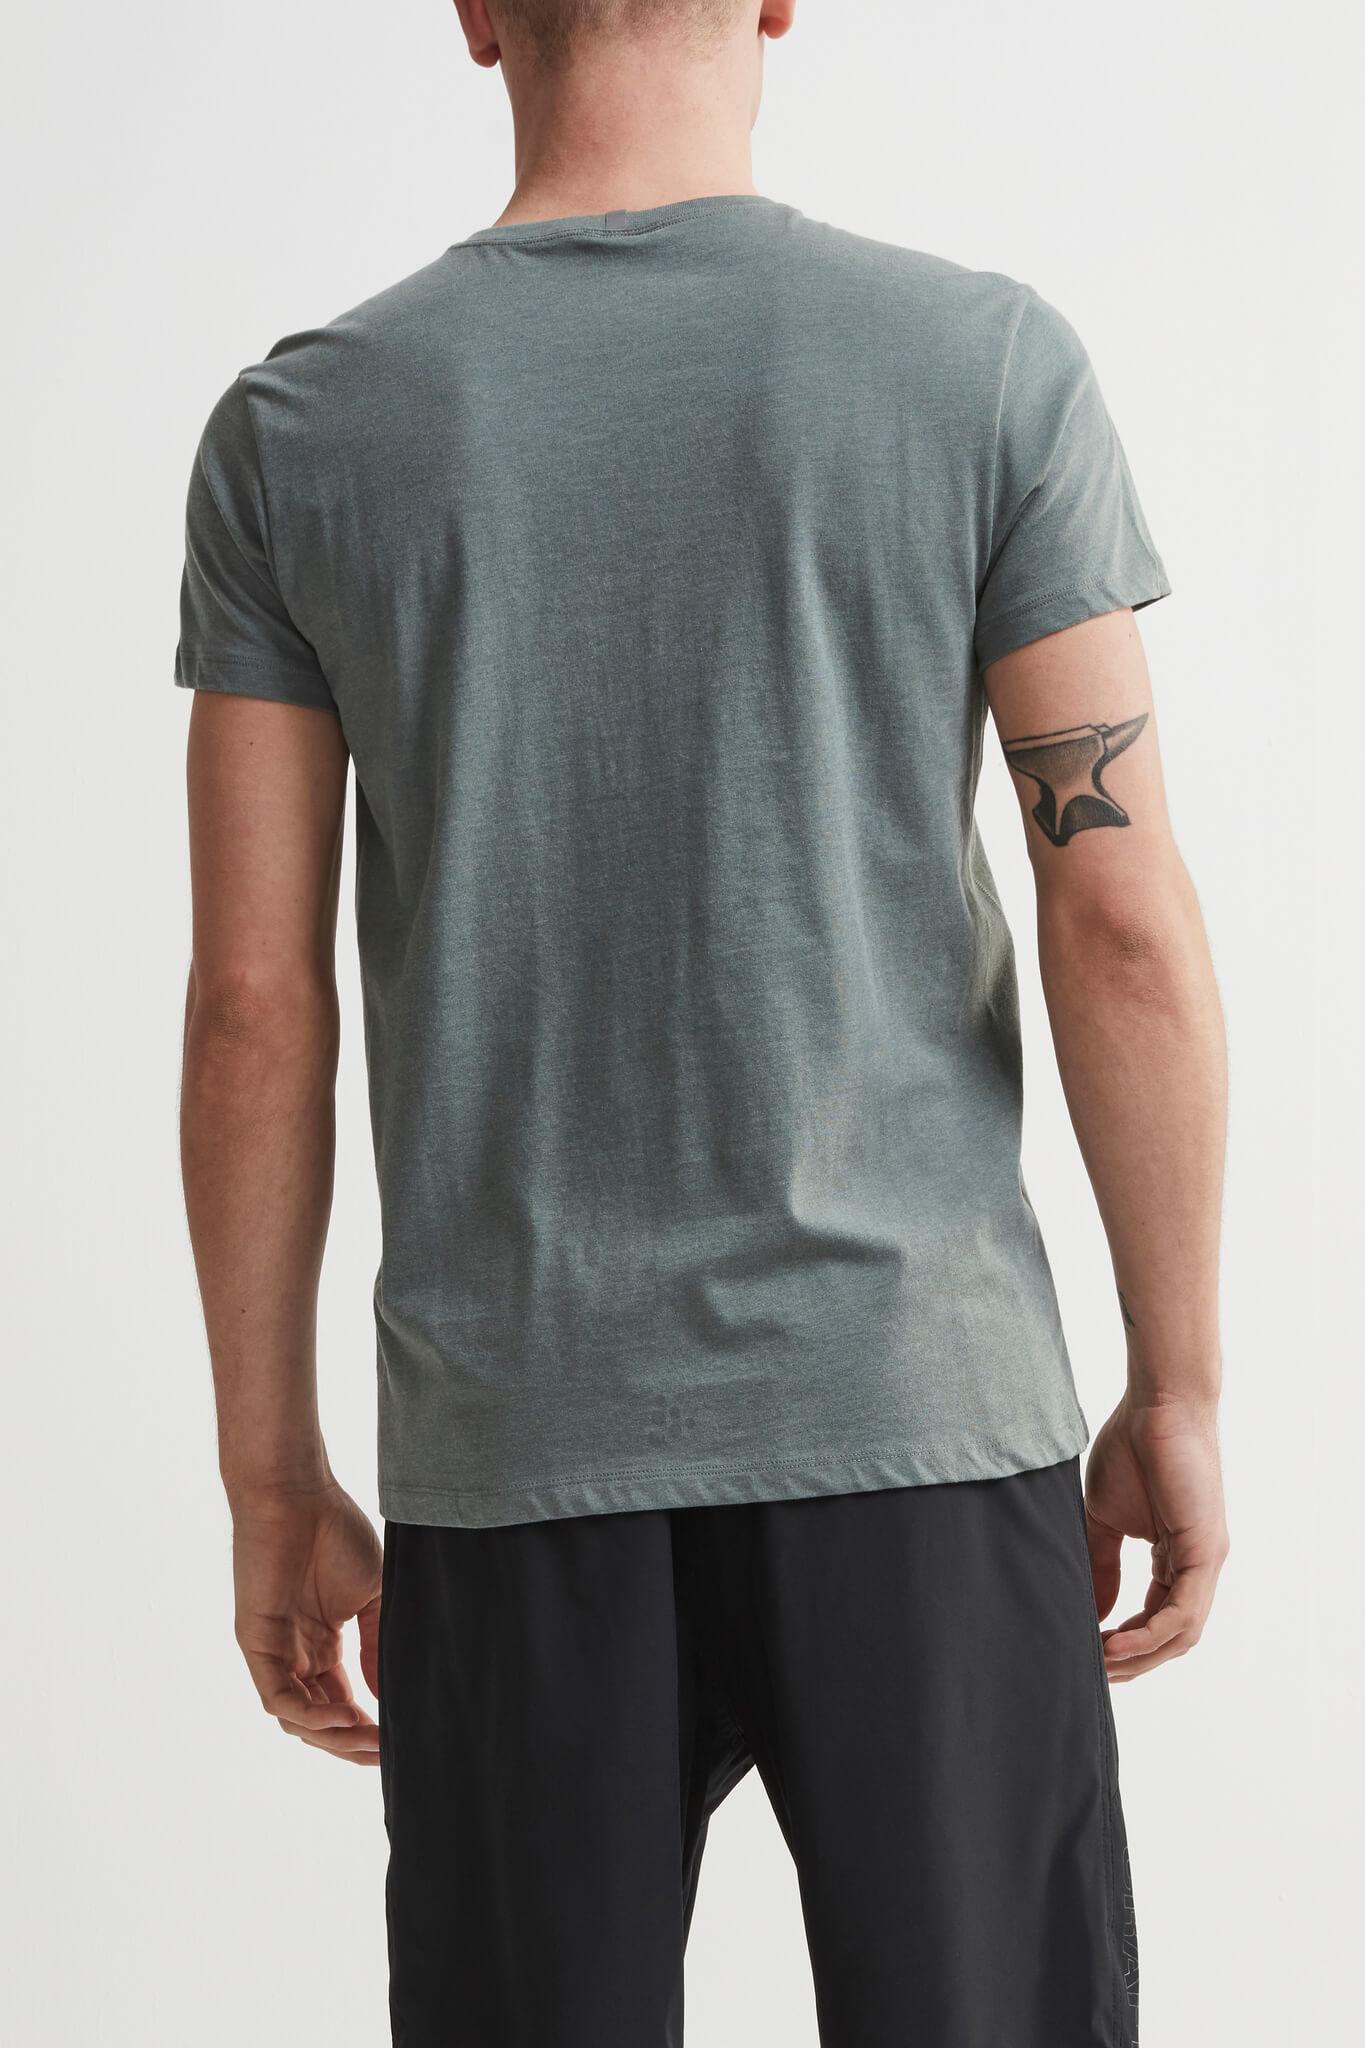 Craft Graghic футболка мужская - 3